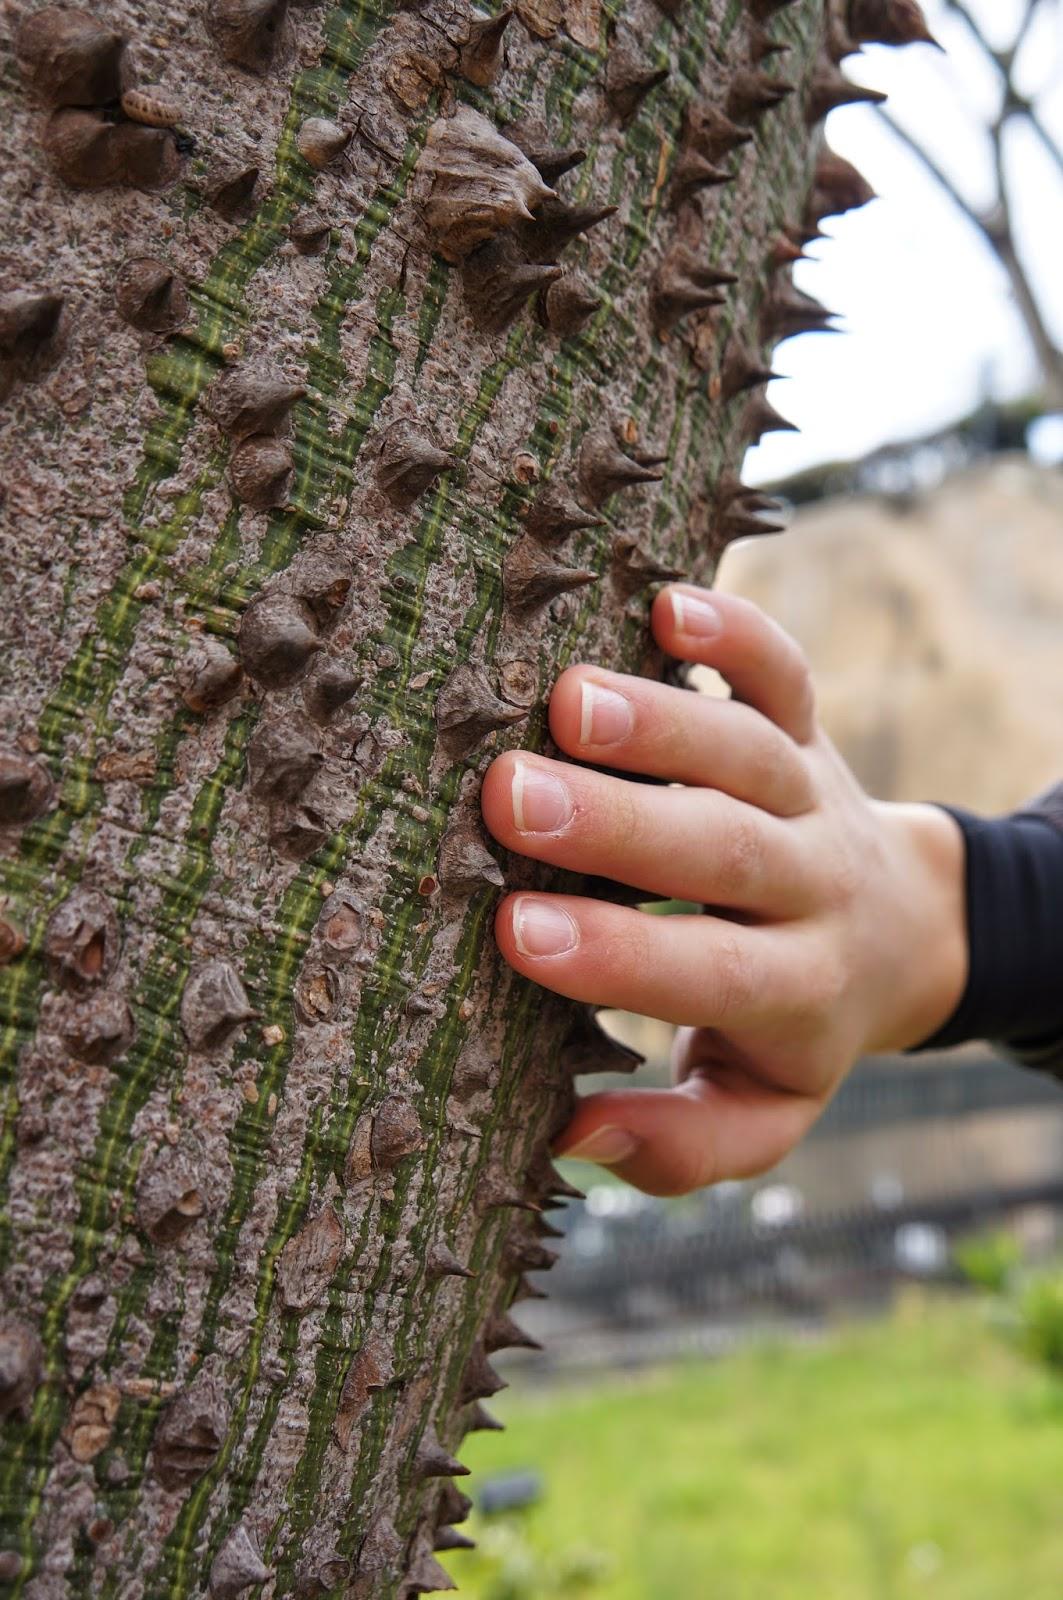 Ceiba speciosa or Ceiba pentandra tree with thorny trunk / bark